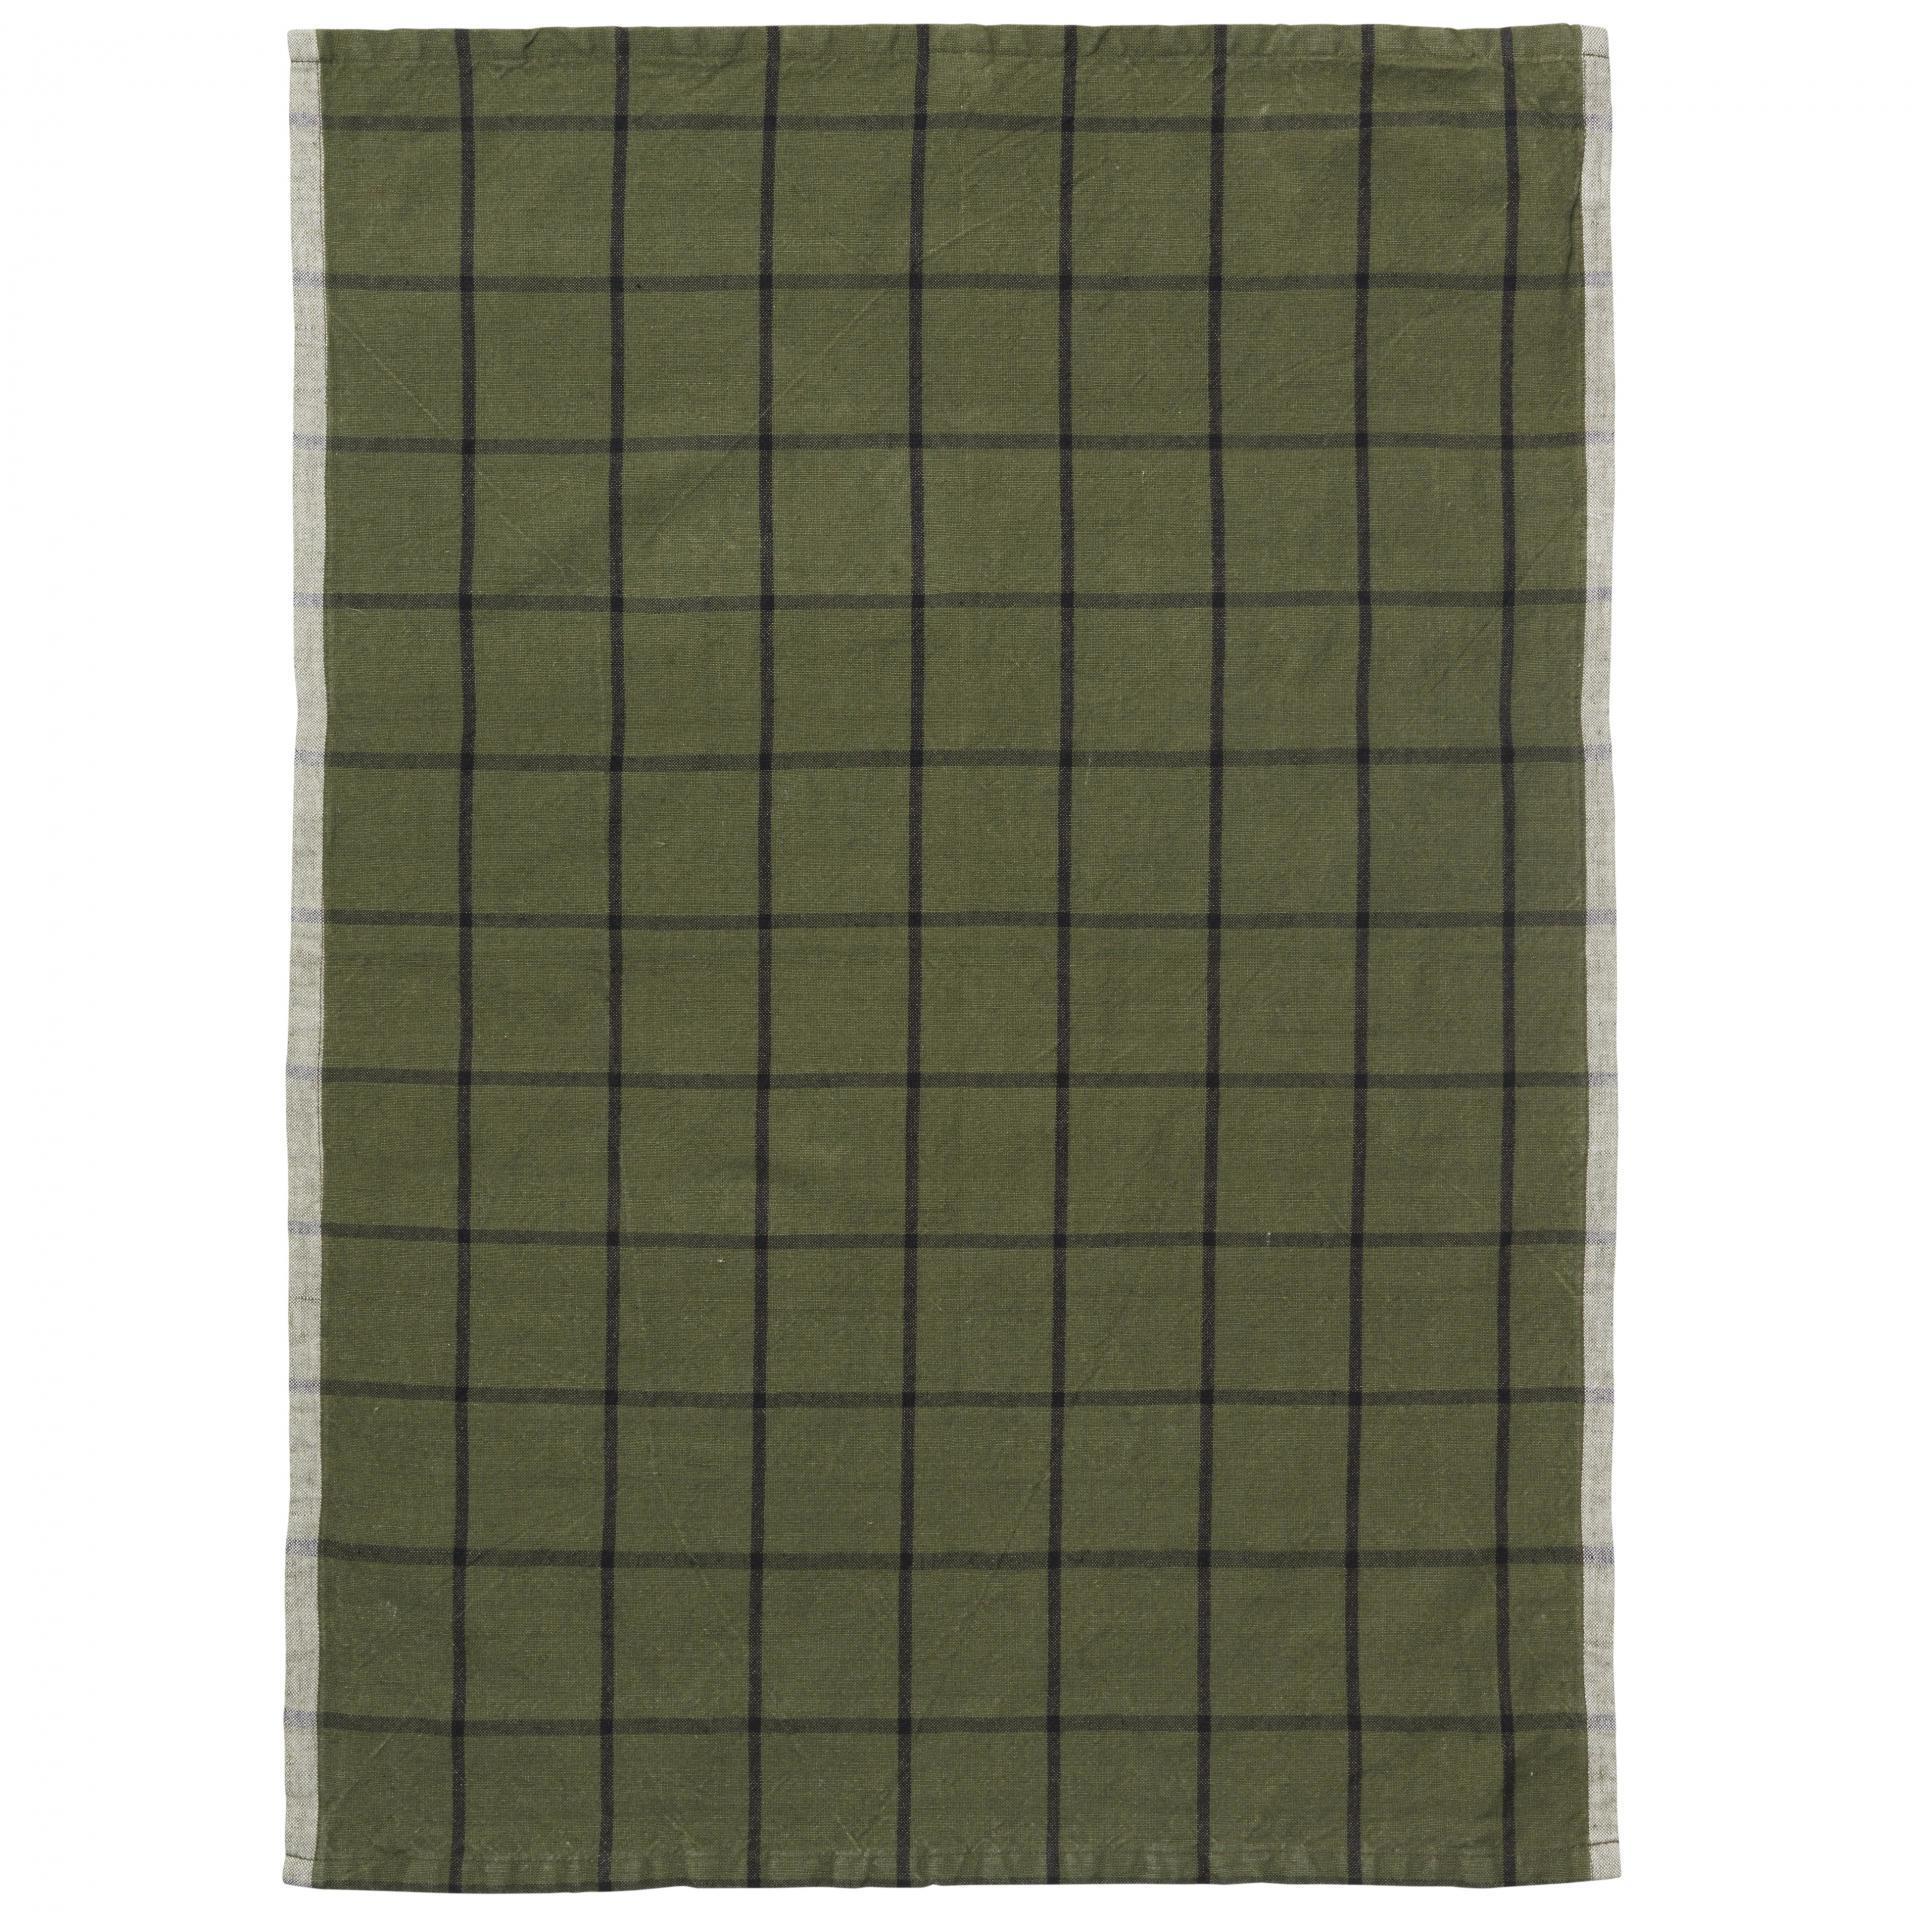 ferm LIVING Kuchyňská utěrka Hale Green/Black, zelená barva, textil